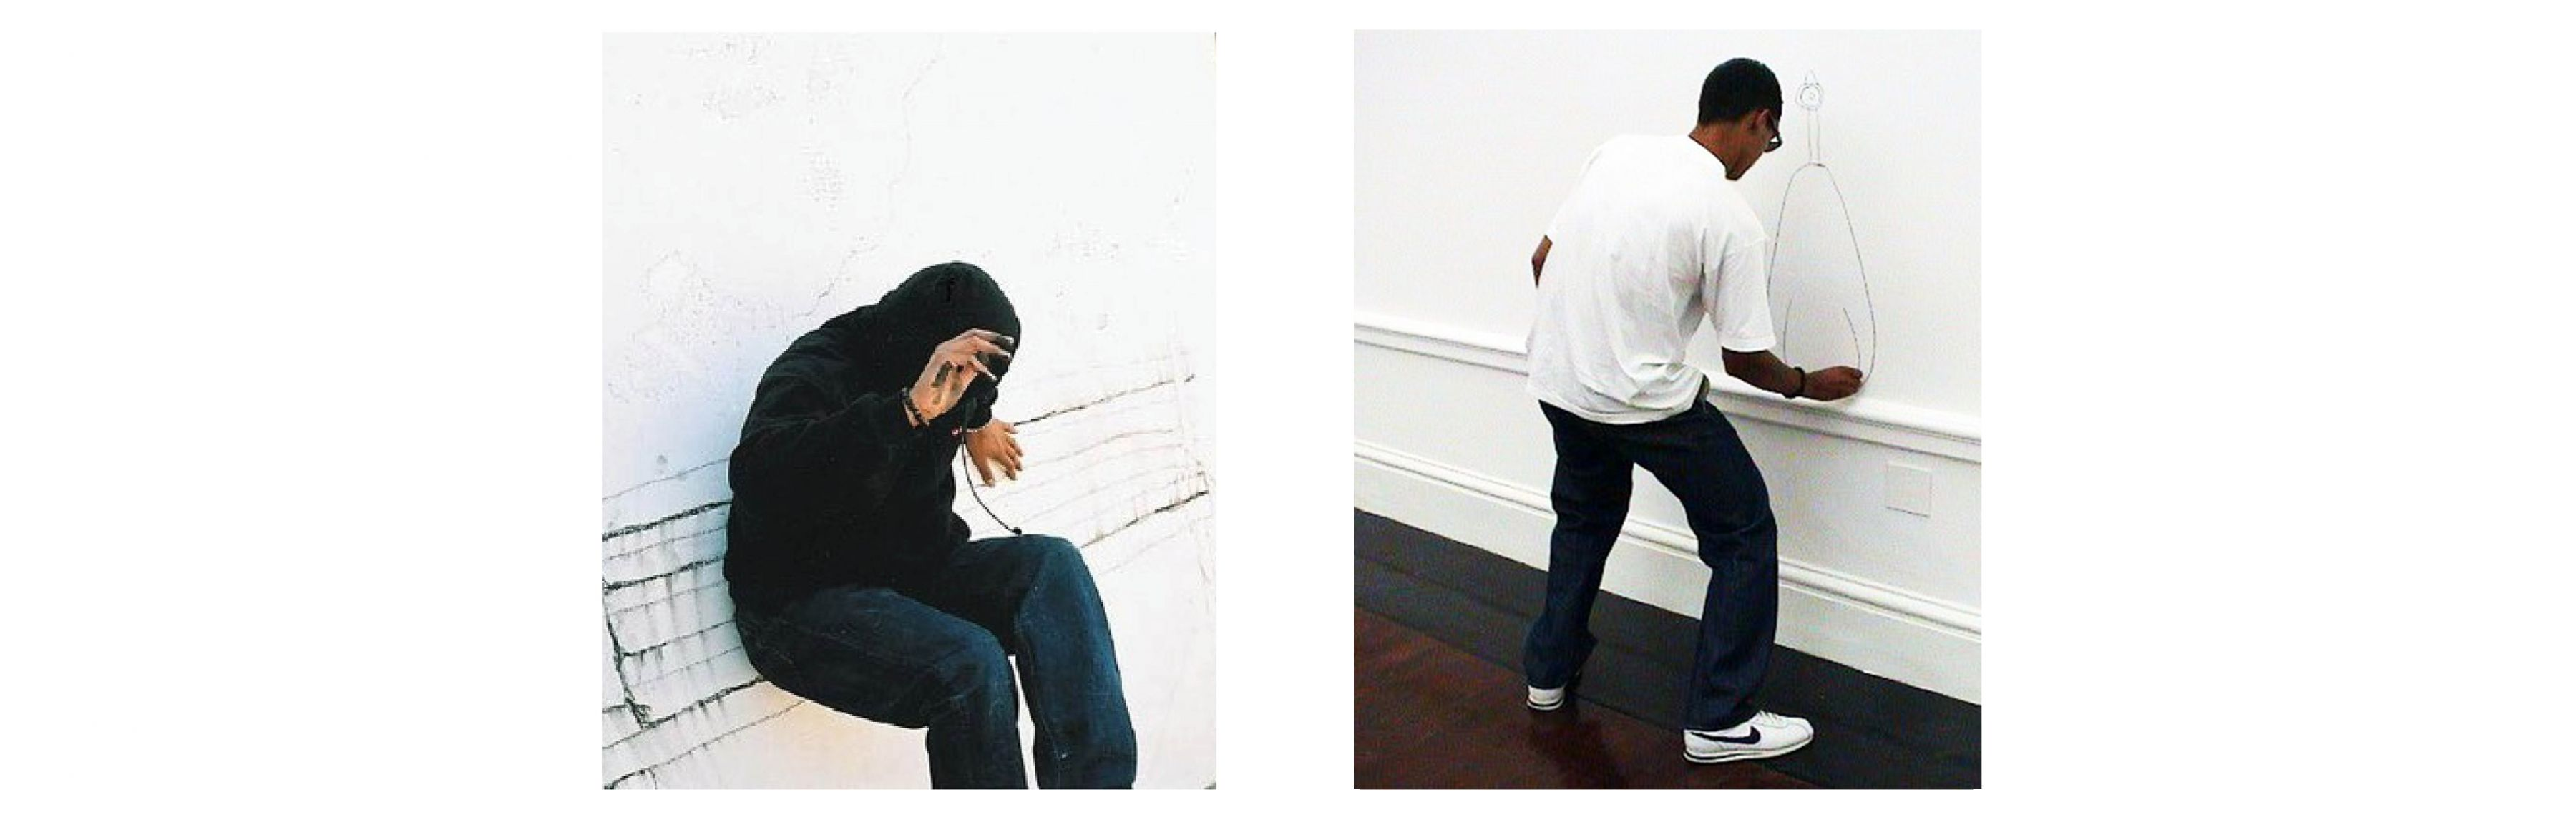 duo drawing image